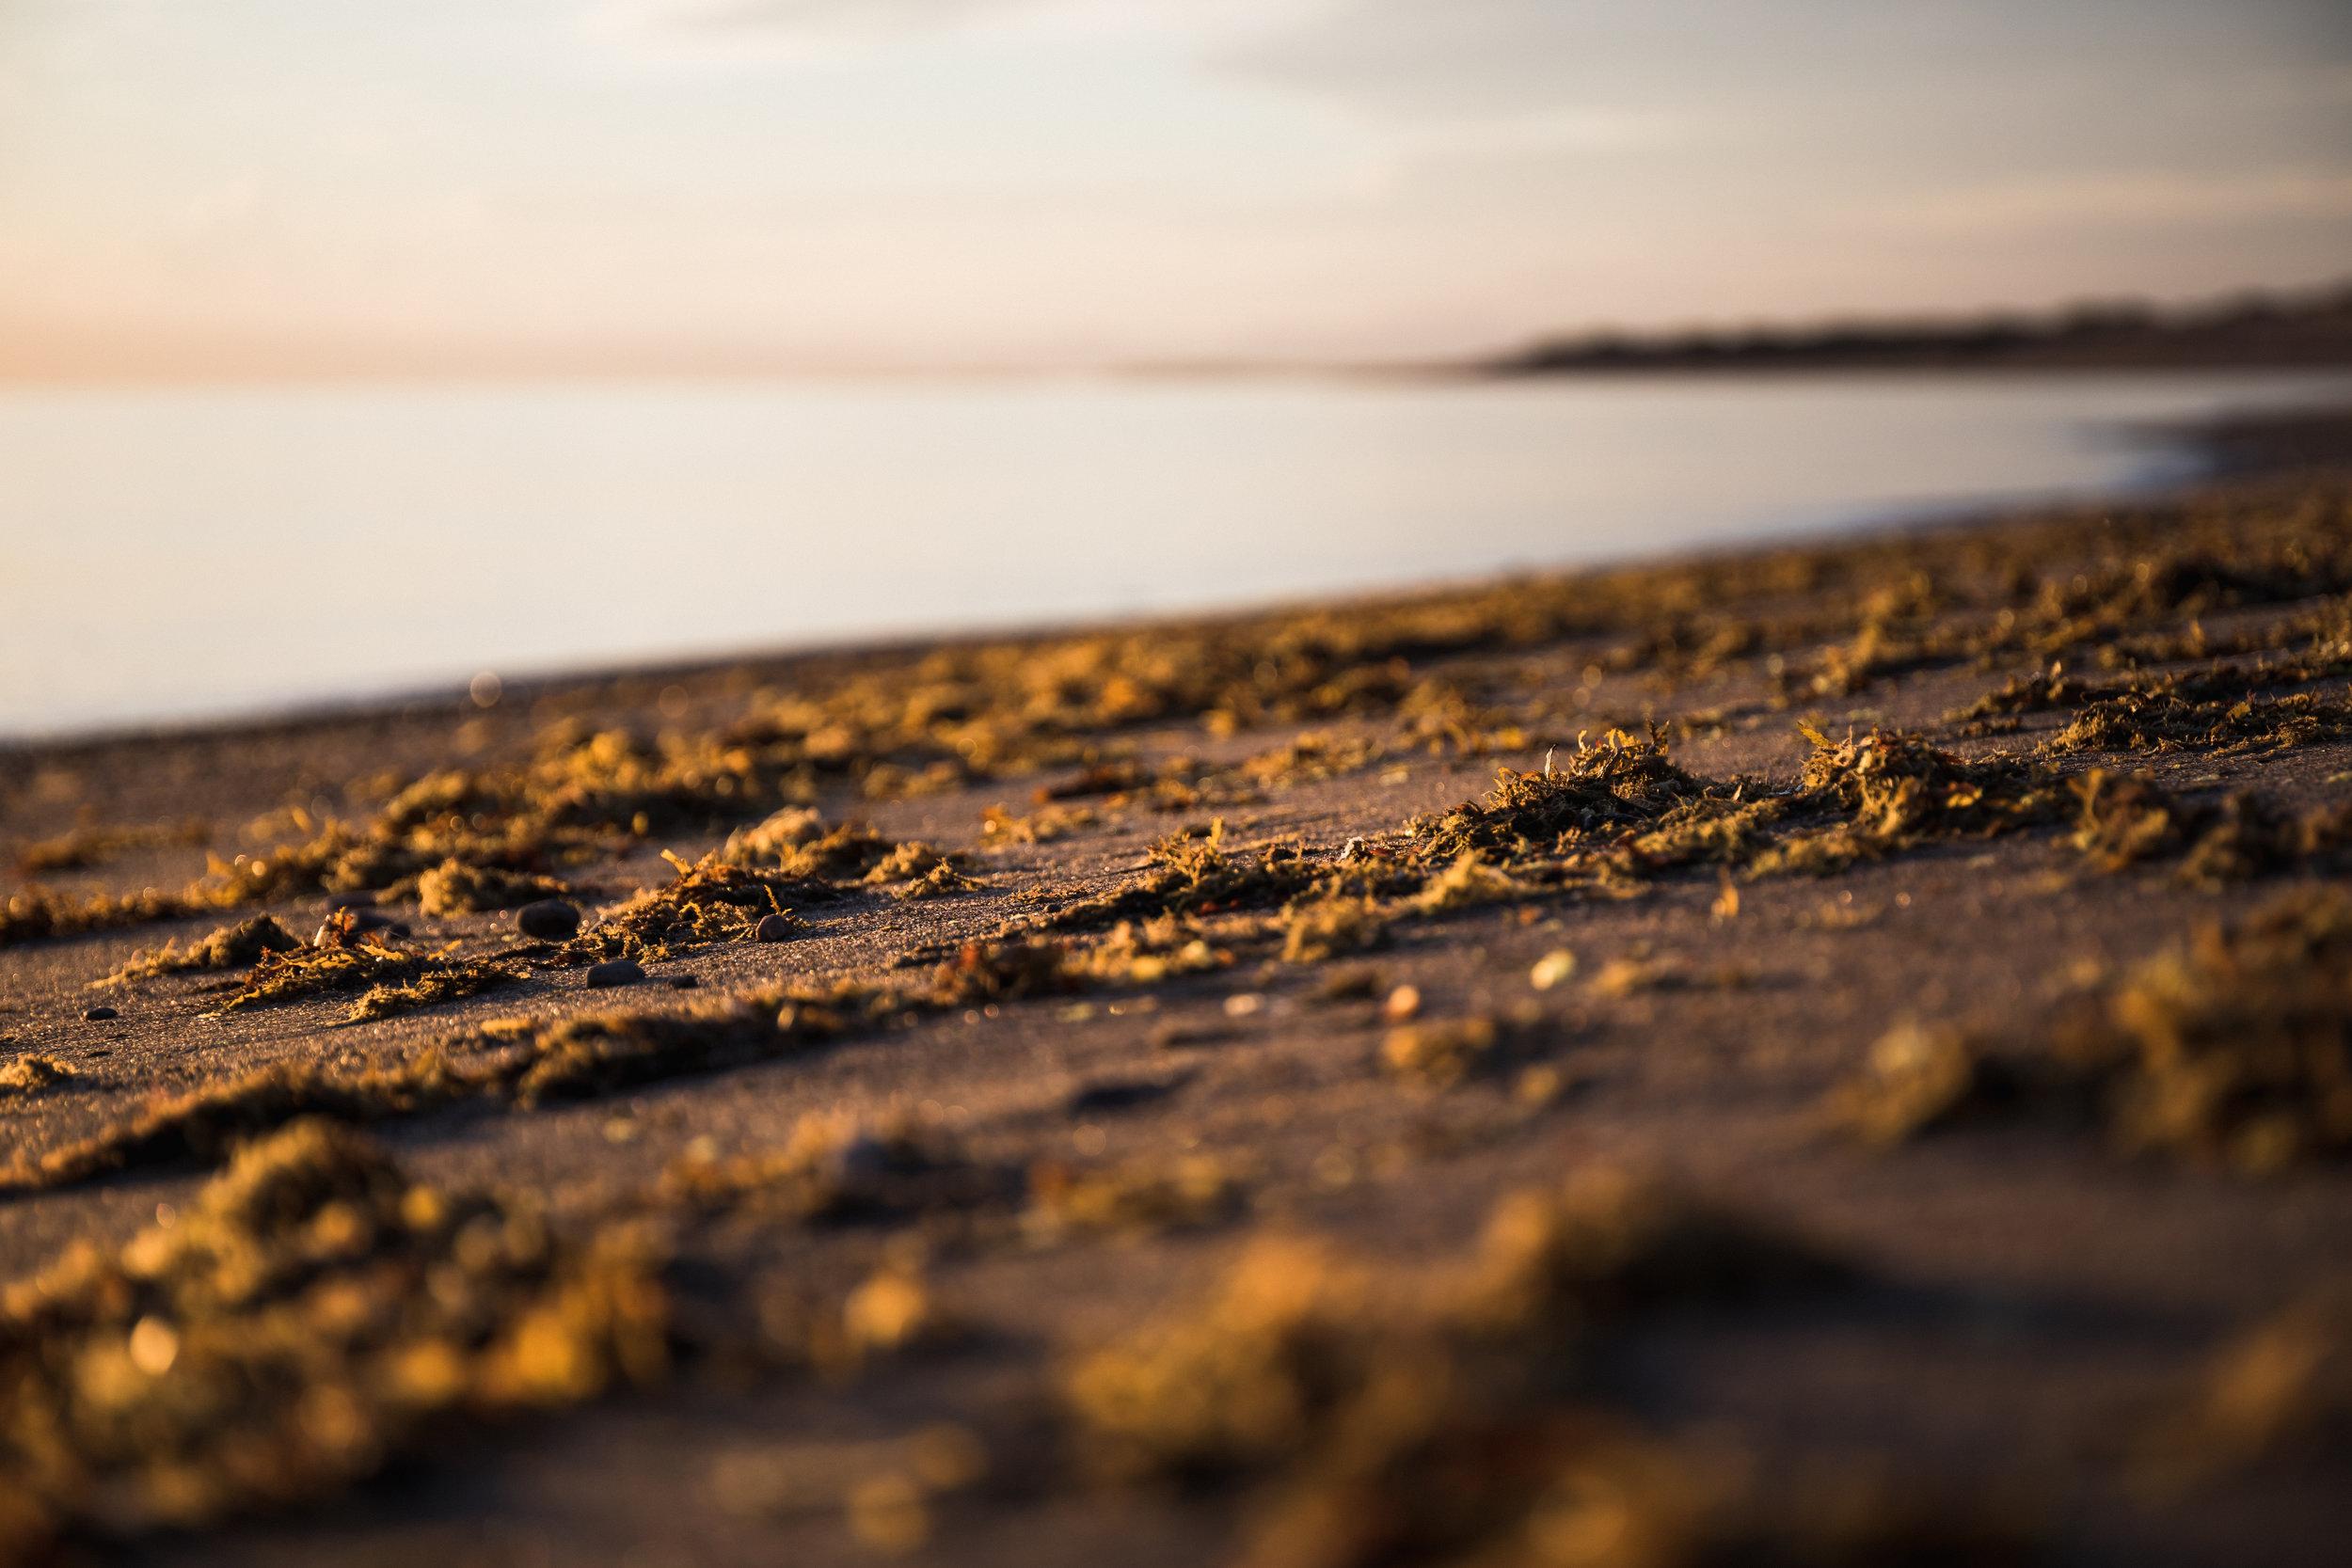 Collecting_Seaweed-5344.jpg